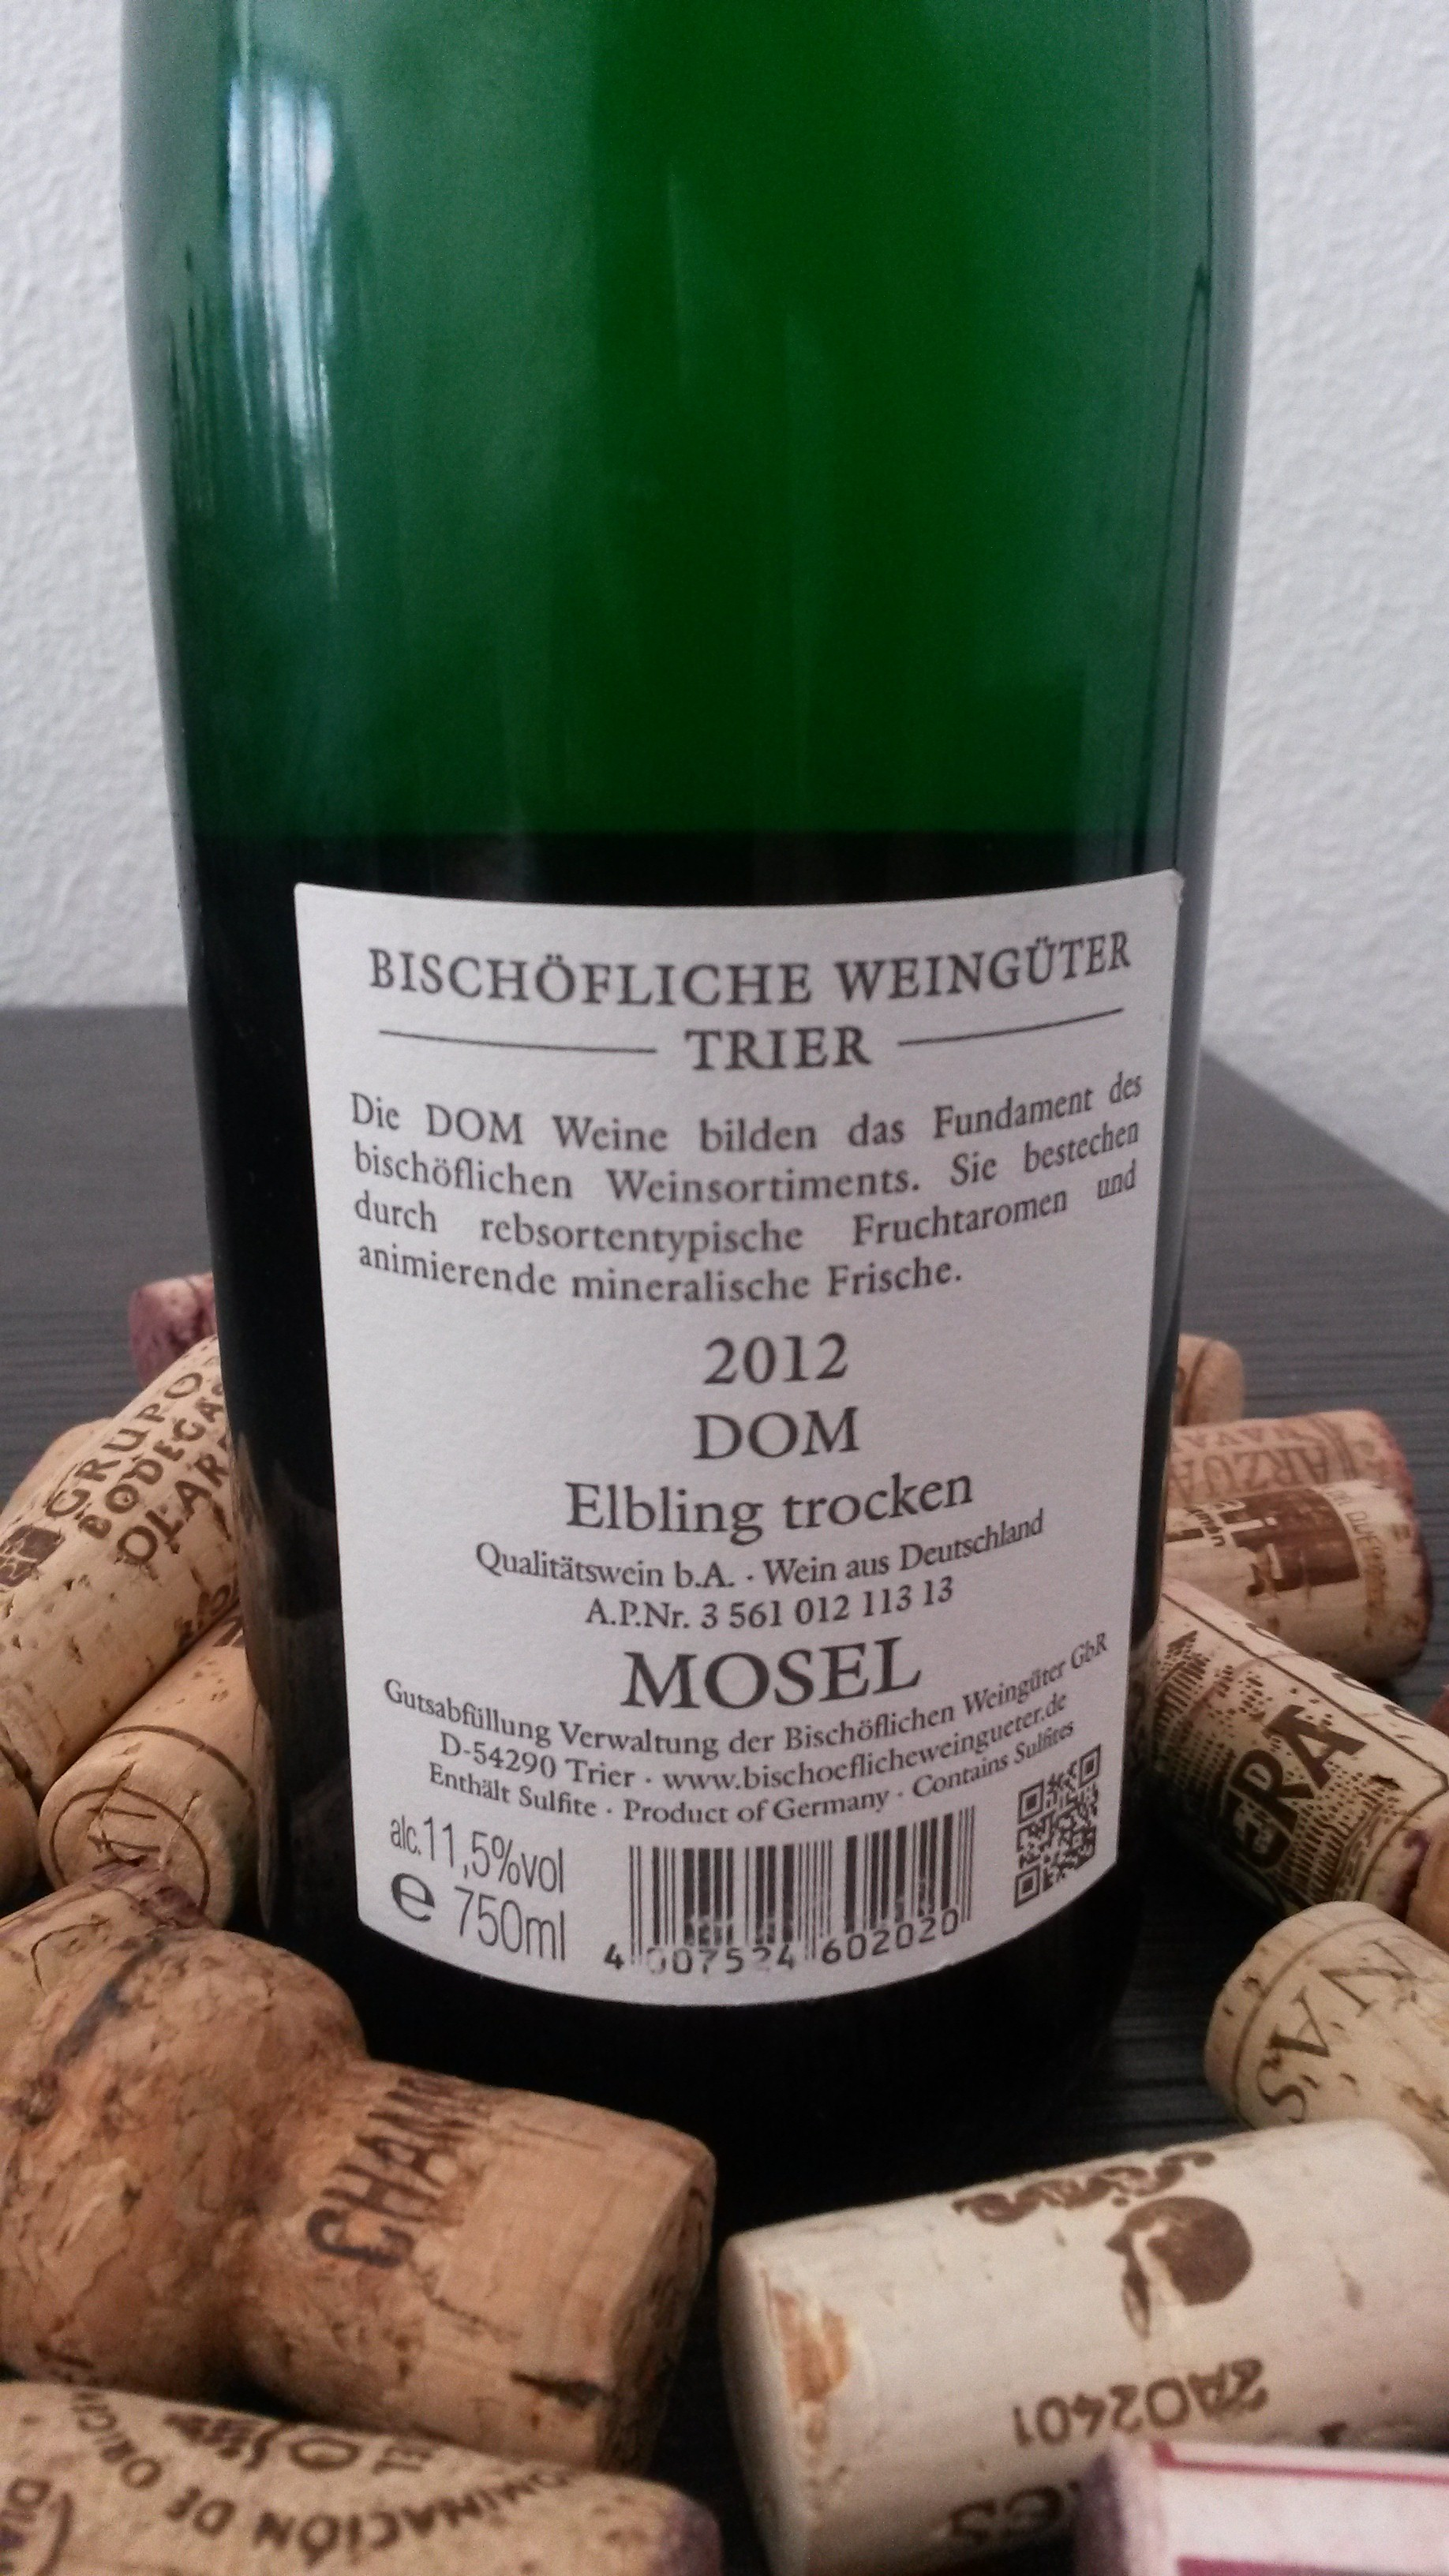 Weingut Trier Mosel